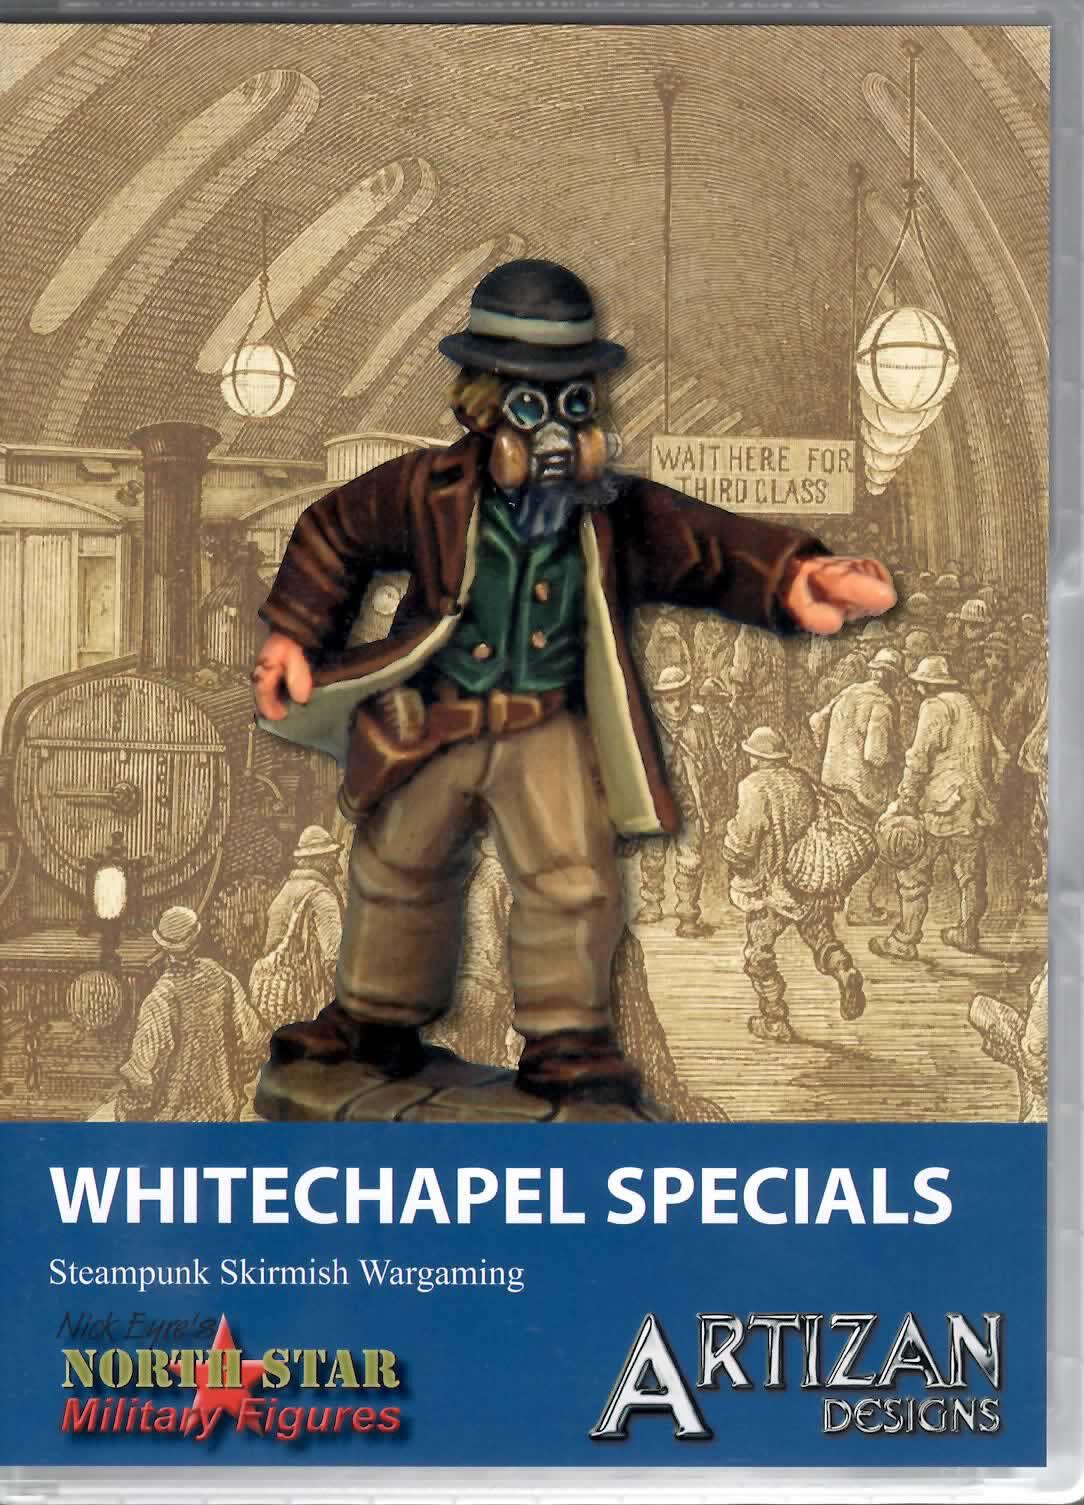 Artizan Designs 28mm Metal Steampunk Skirmish Whitechapel Specials (10)